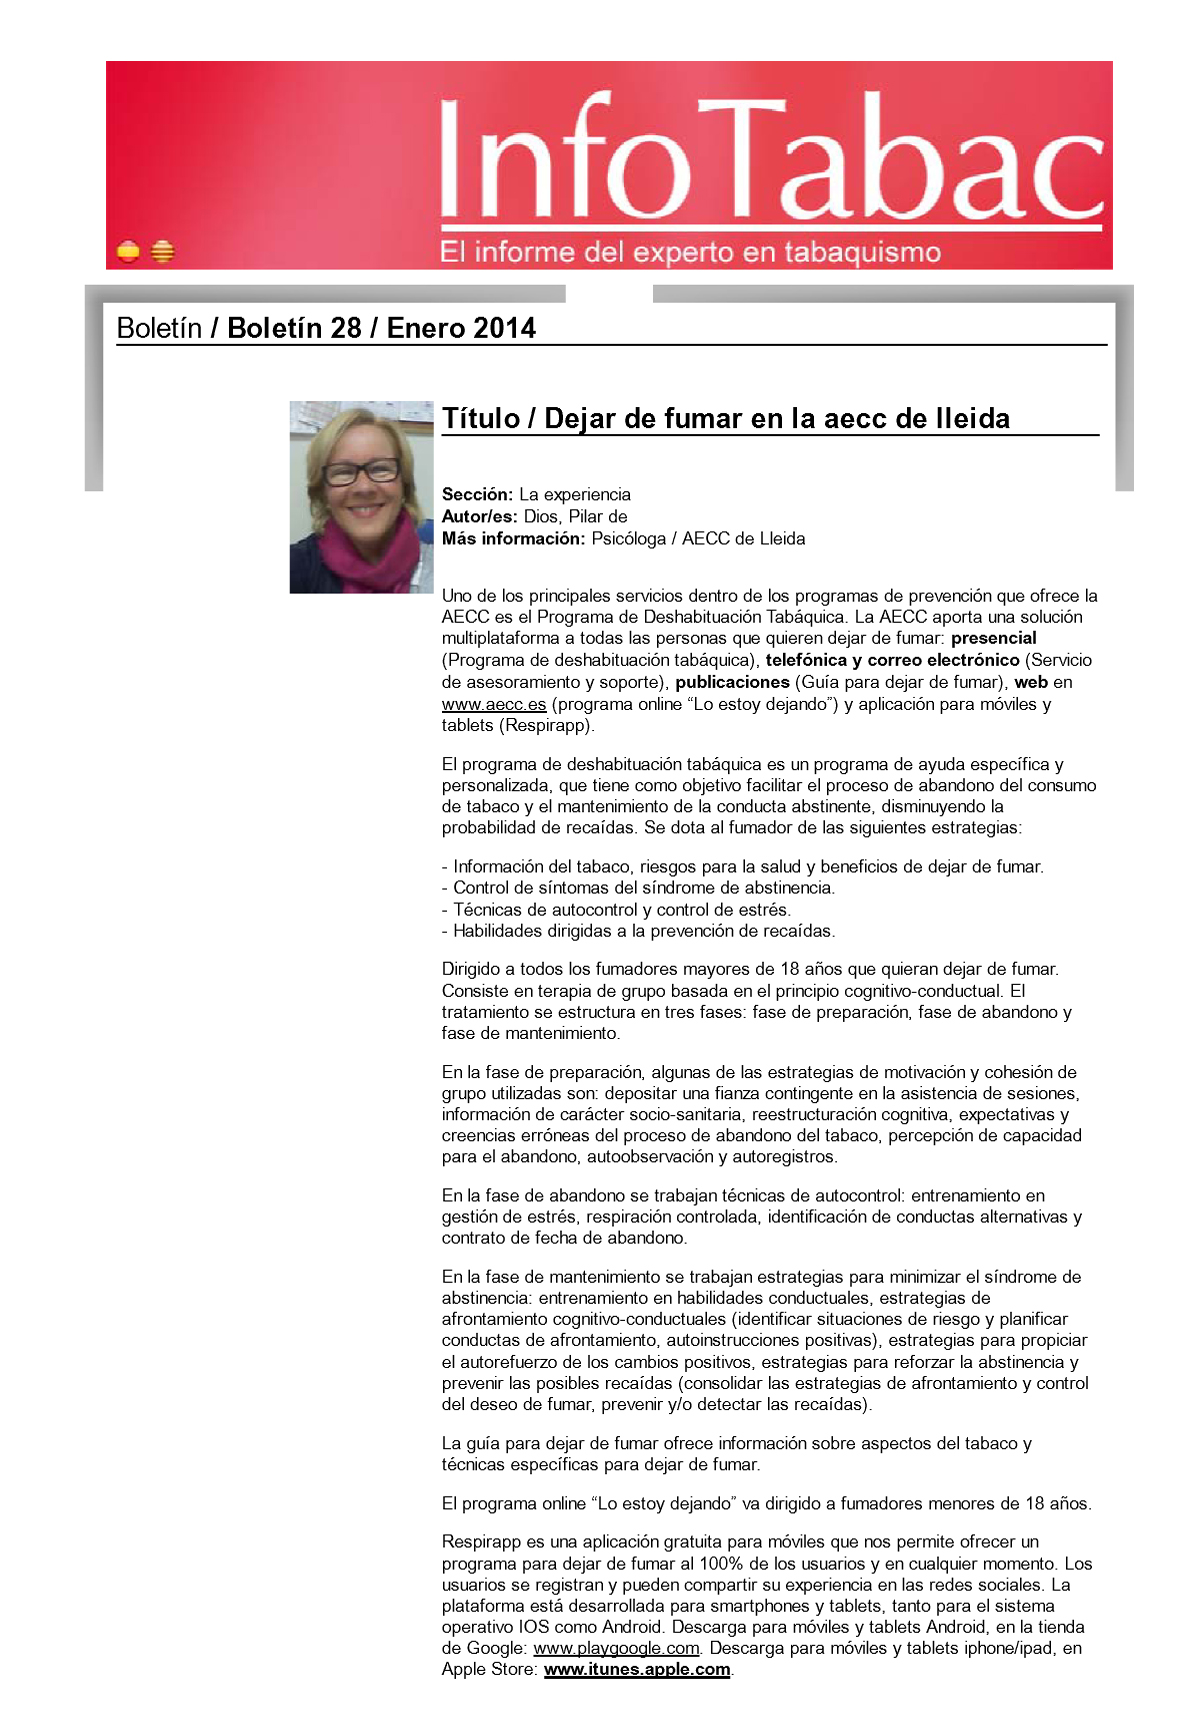 Info tabac digital nº28 - Enero 2014